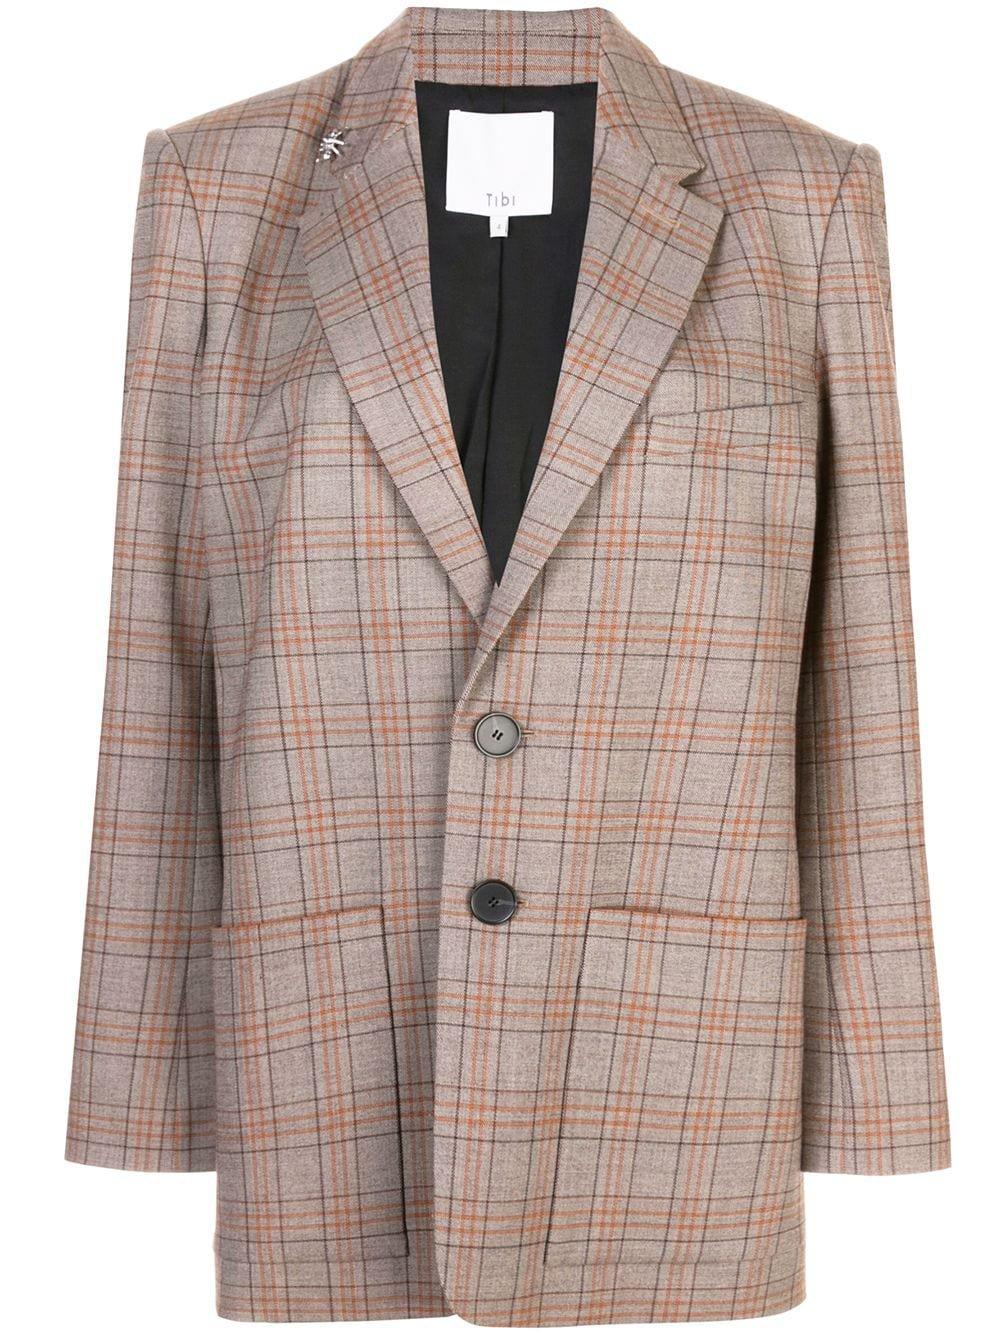 Tibi James check men's blazer $850 - Buy Online SS19 - Quick Shipping, Price